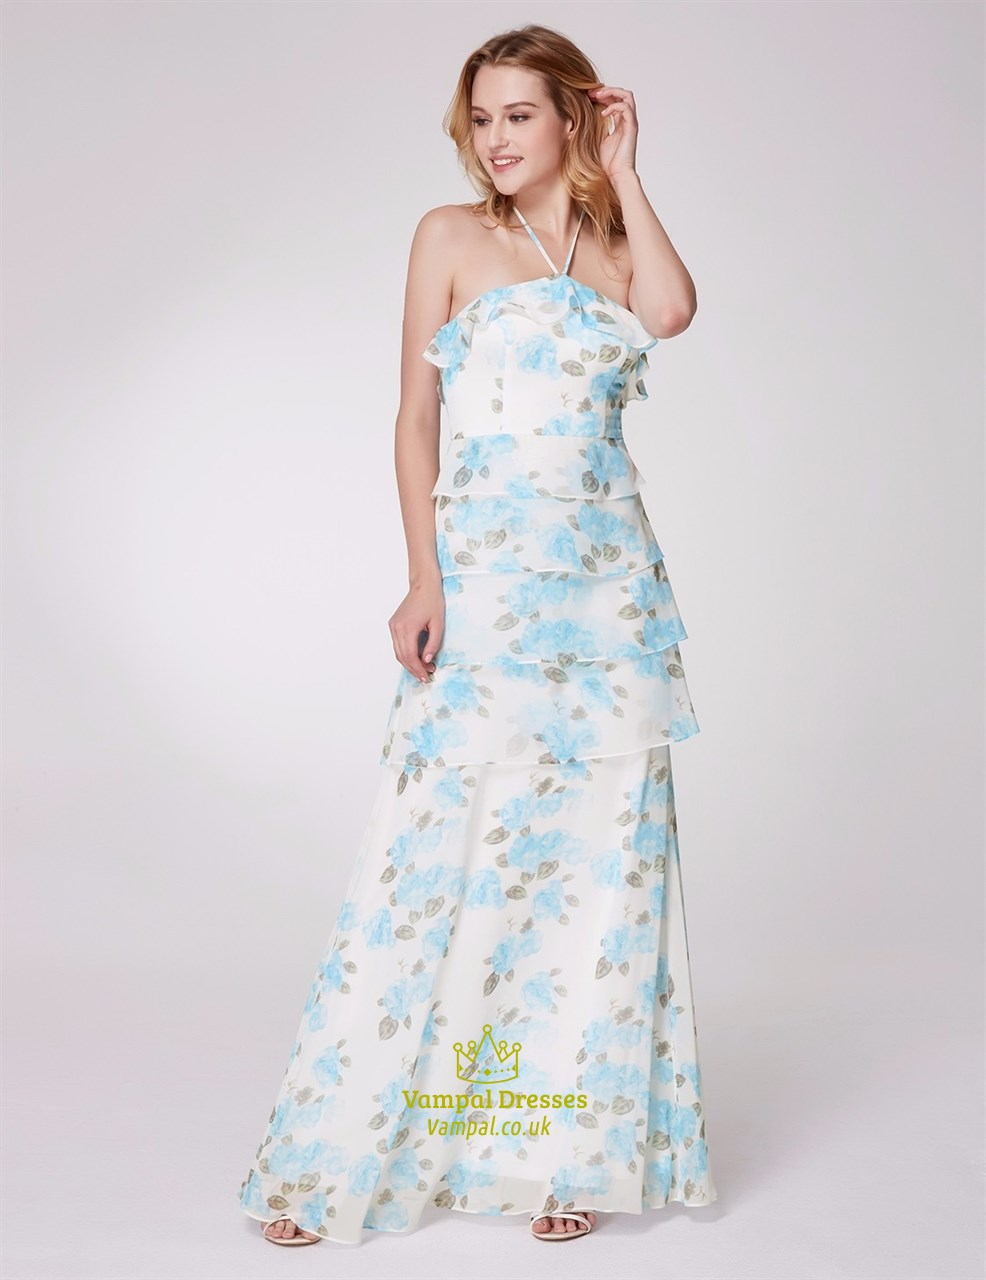 35ad073c2 Light Blue Halter Neck Sleeveless Tiered Ruffle Chiffon Floral Print ...